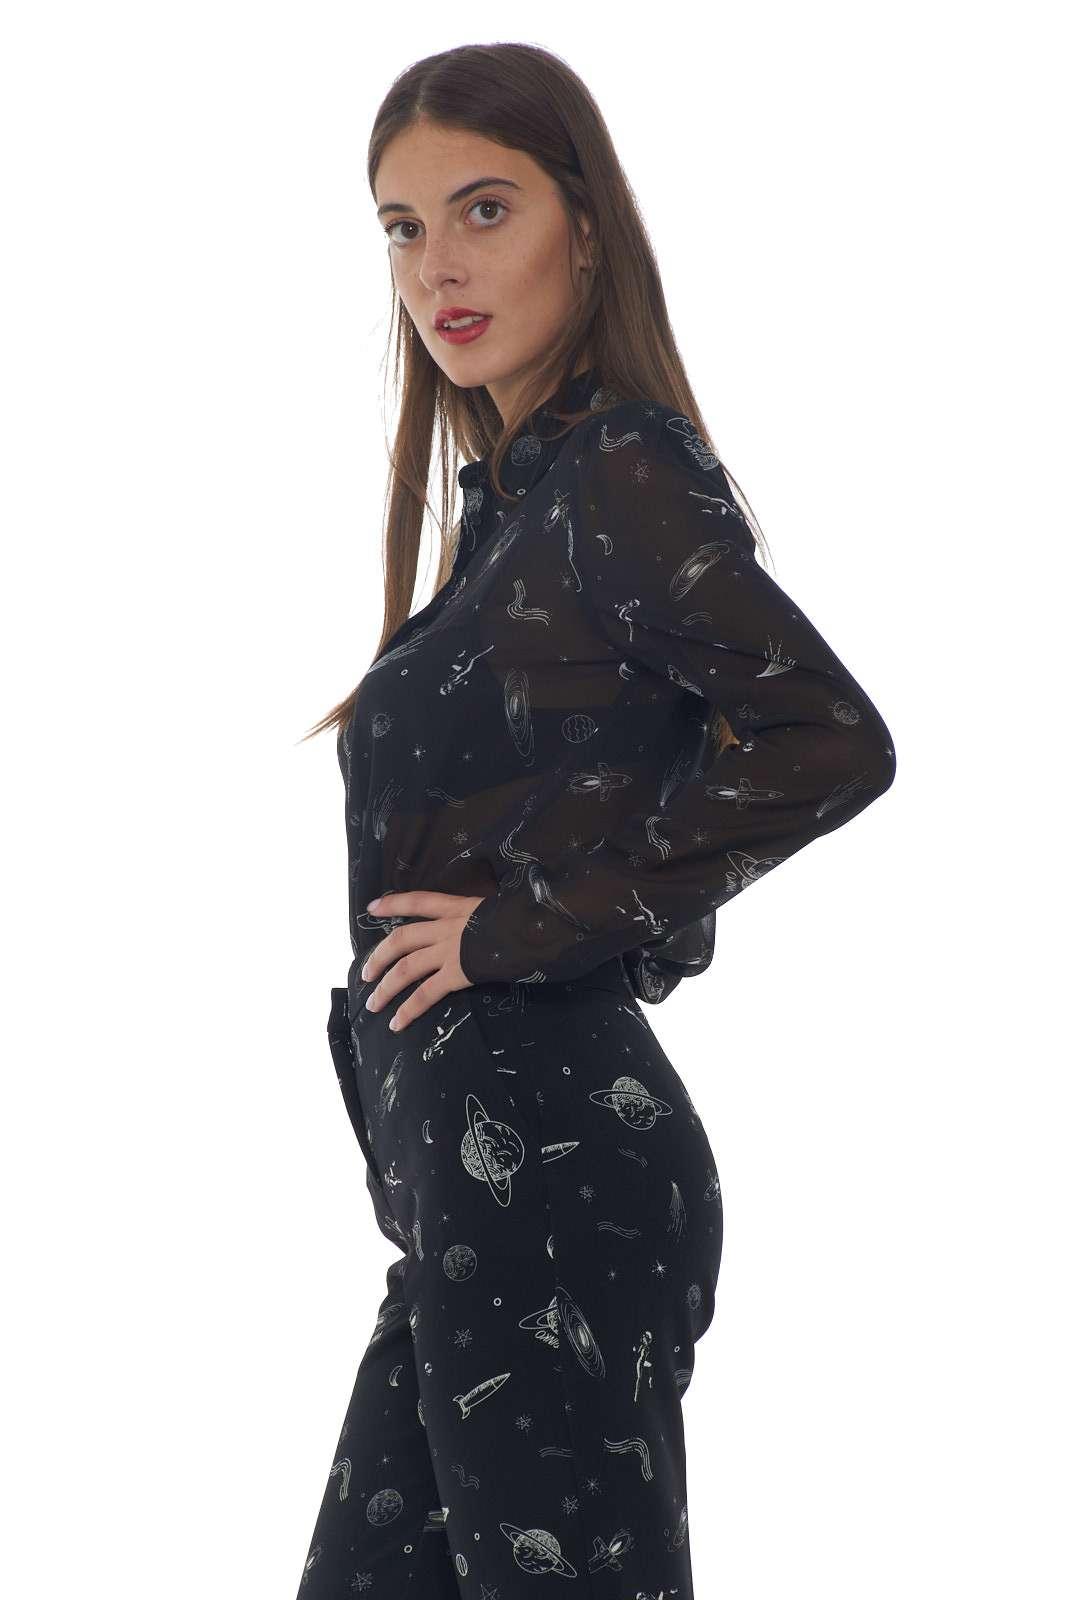 https://www.parmax.com/media/catalog/product/a/i/AI-outlet_parmax-camicia-donna-Pinko-1B145W-B.jpg